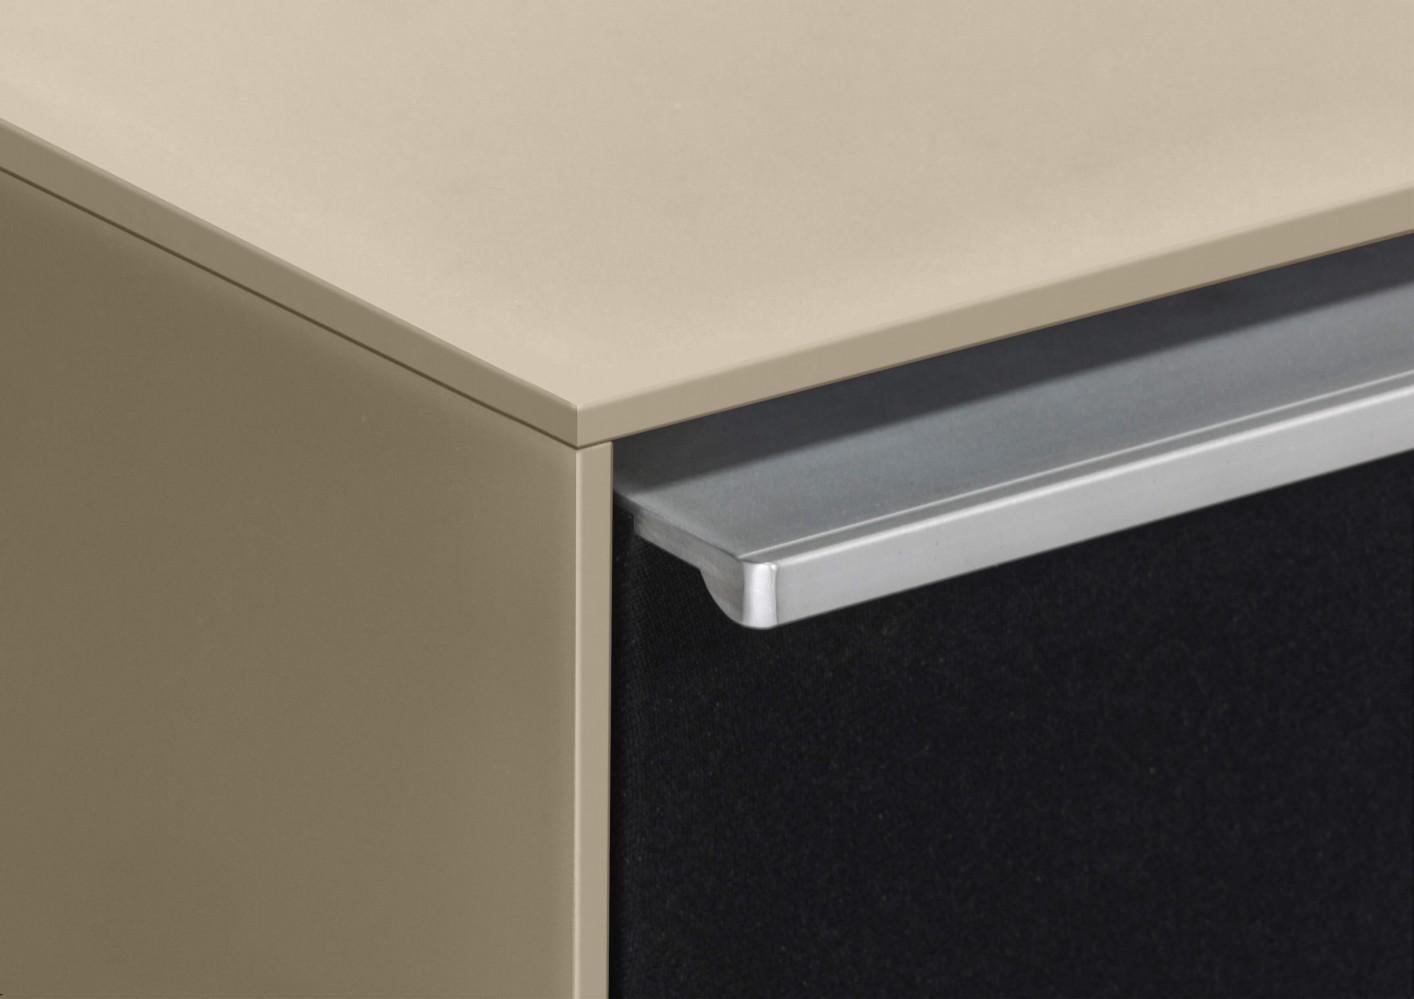 maja mobel soundboard 140 cm glas weissglas matt 7736 3673